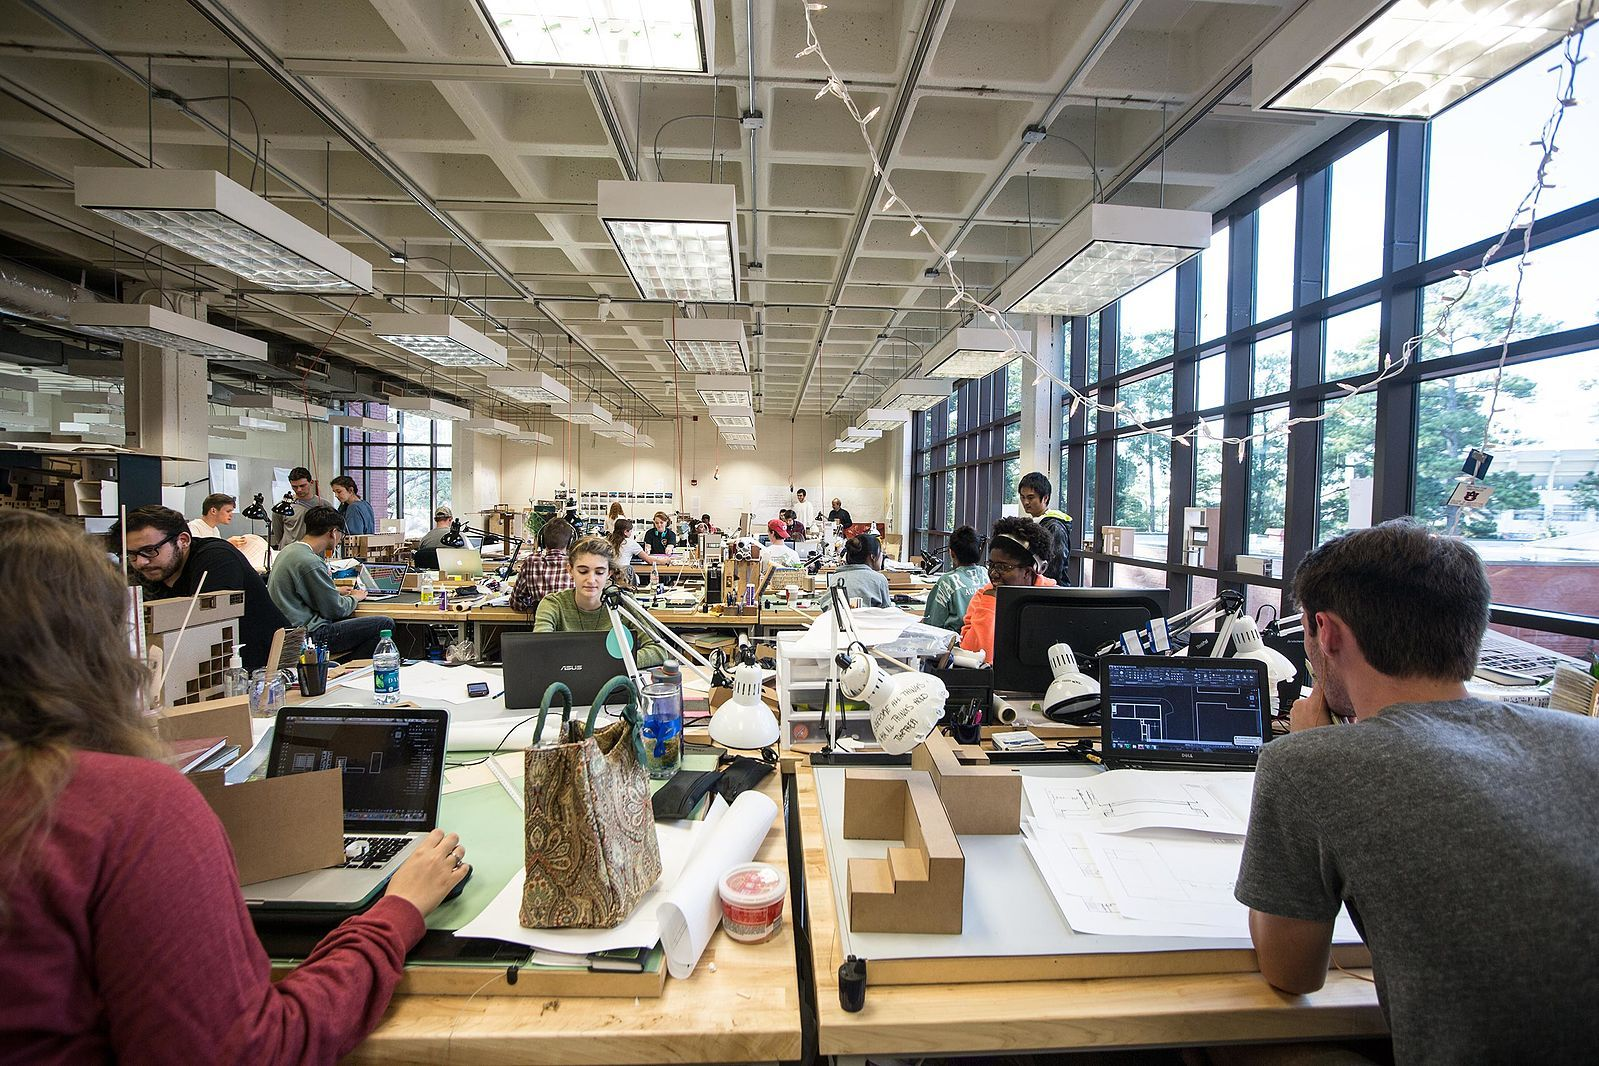 Architectural education is it actually preparing our - Auburn university interior design program ...